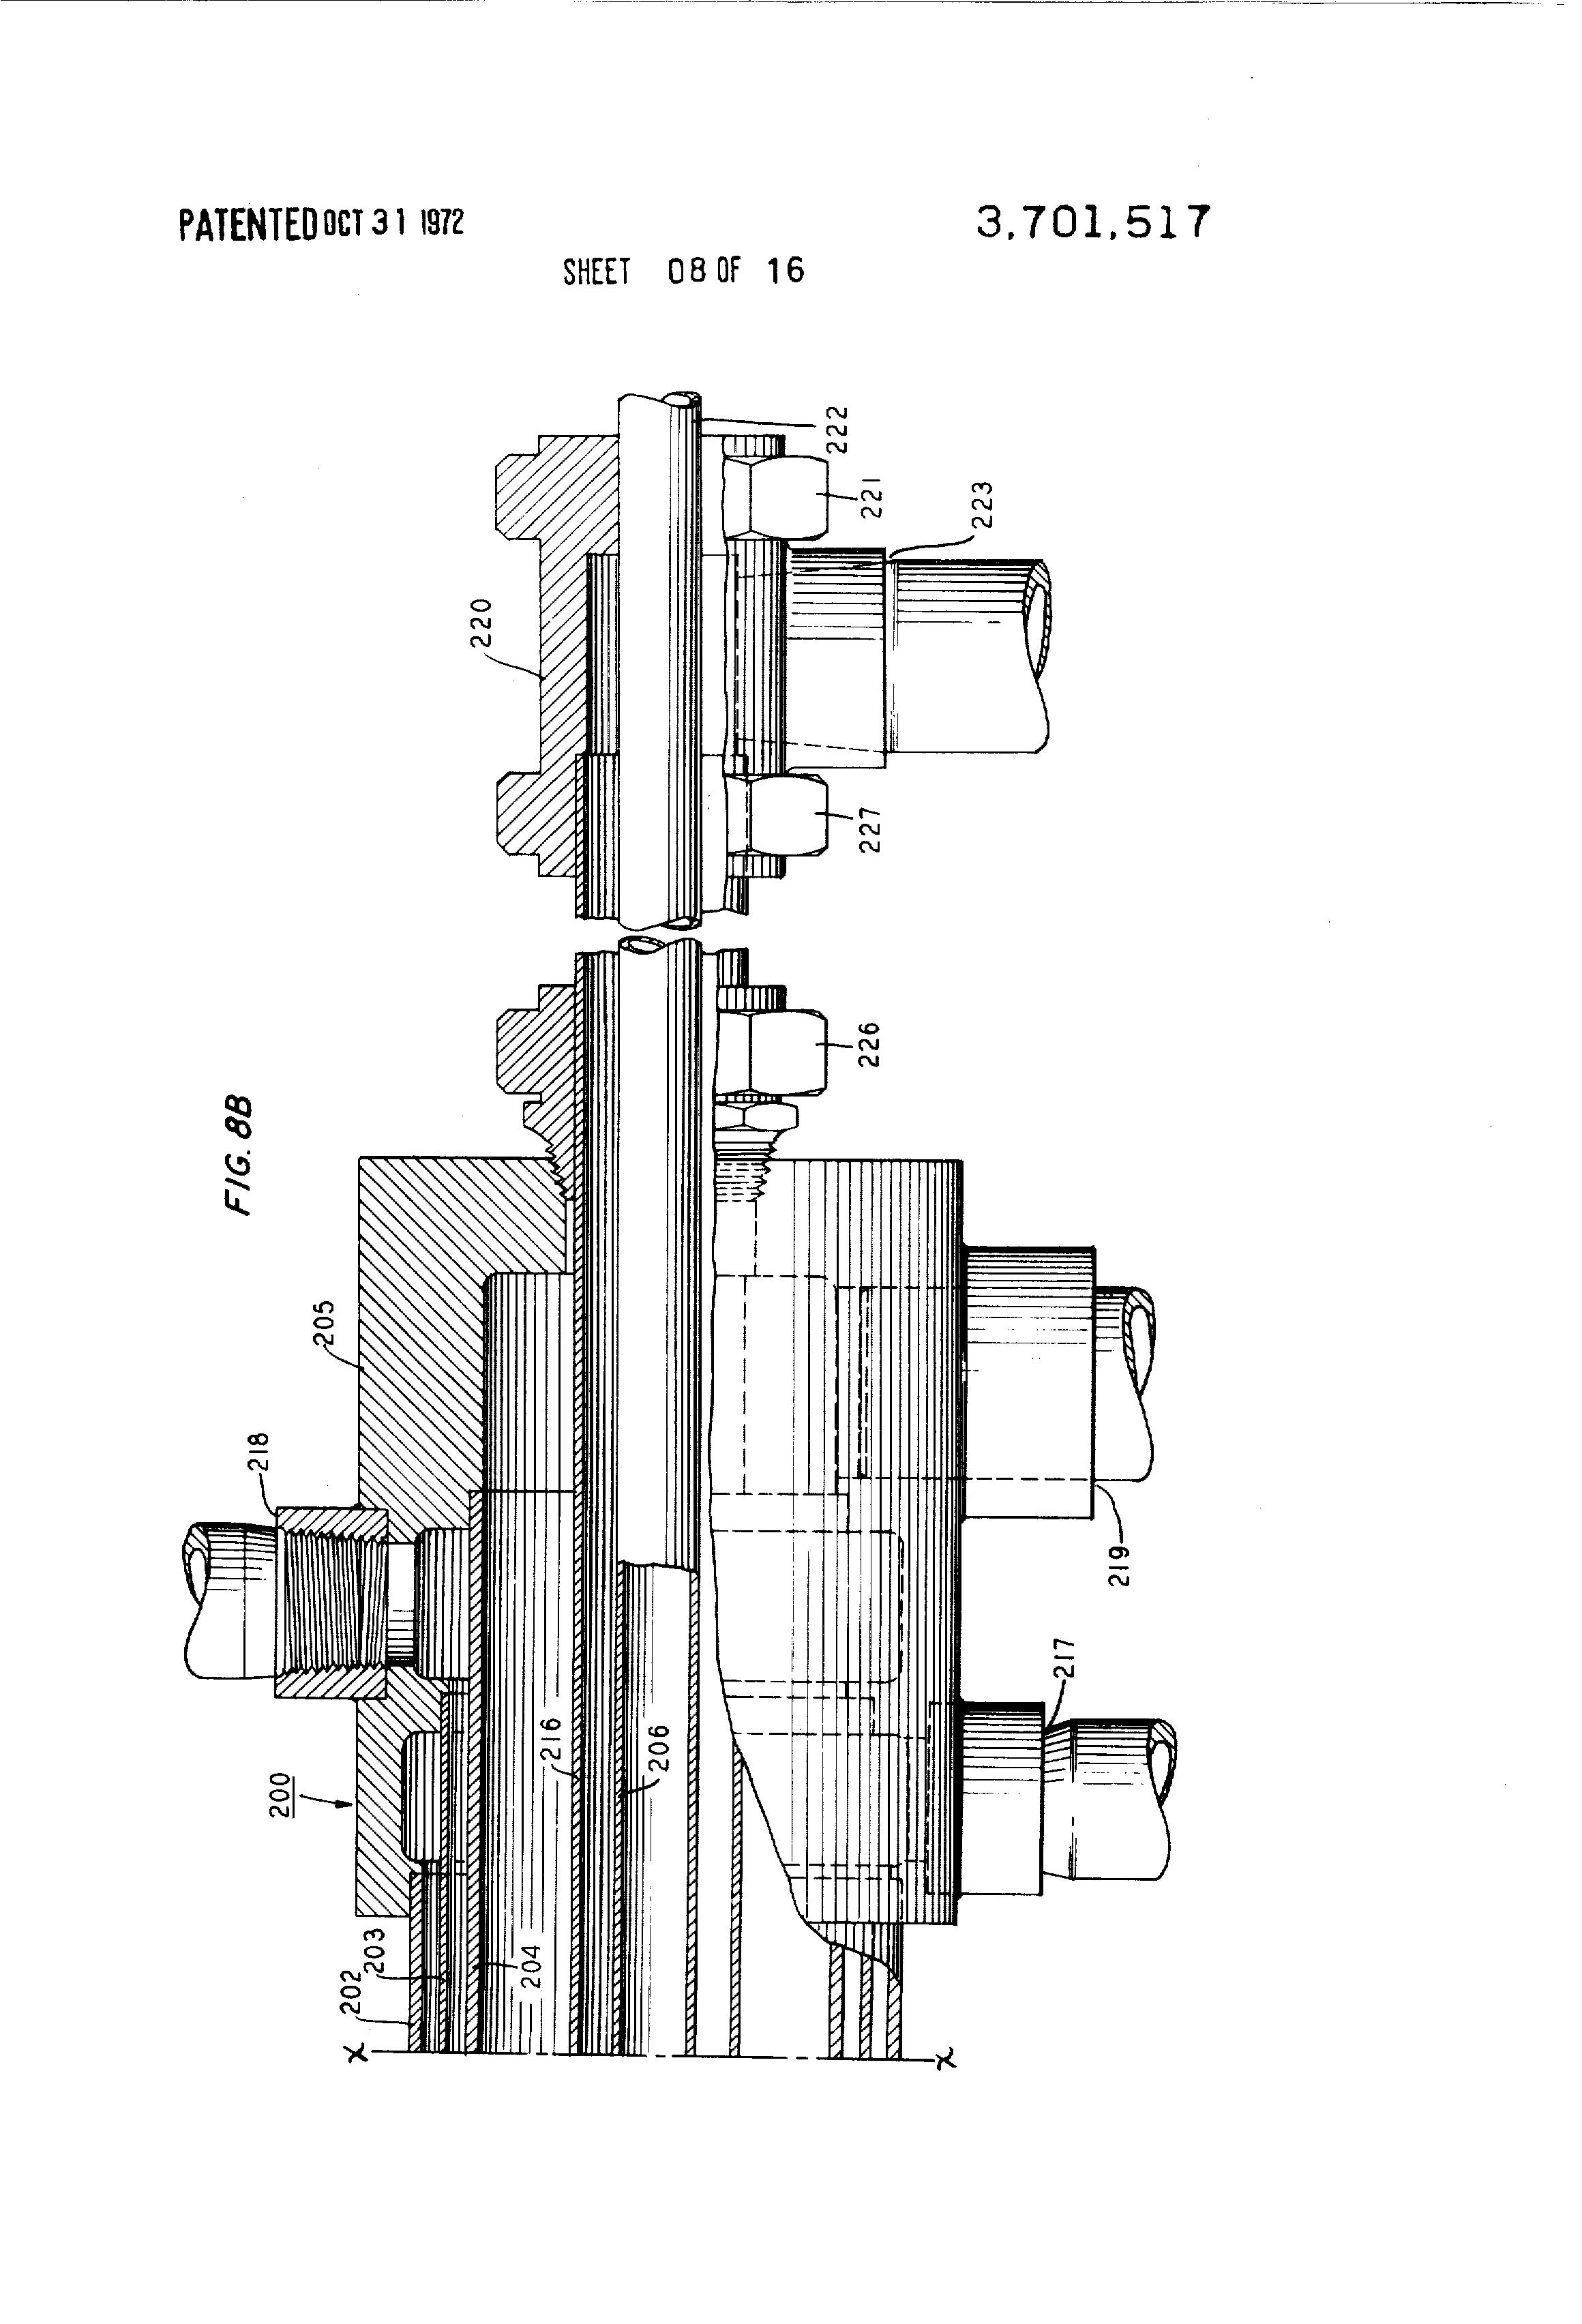 Furnace Blower Wiring Diagram 2890 566 Just Wirings Hvac Relay Scotsman Ice Machine Schematic Marvel Basic Intertherm